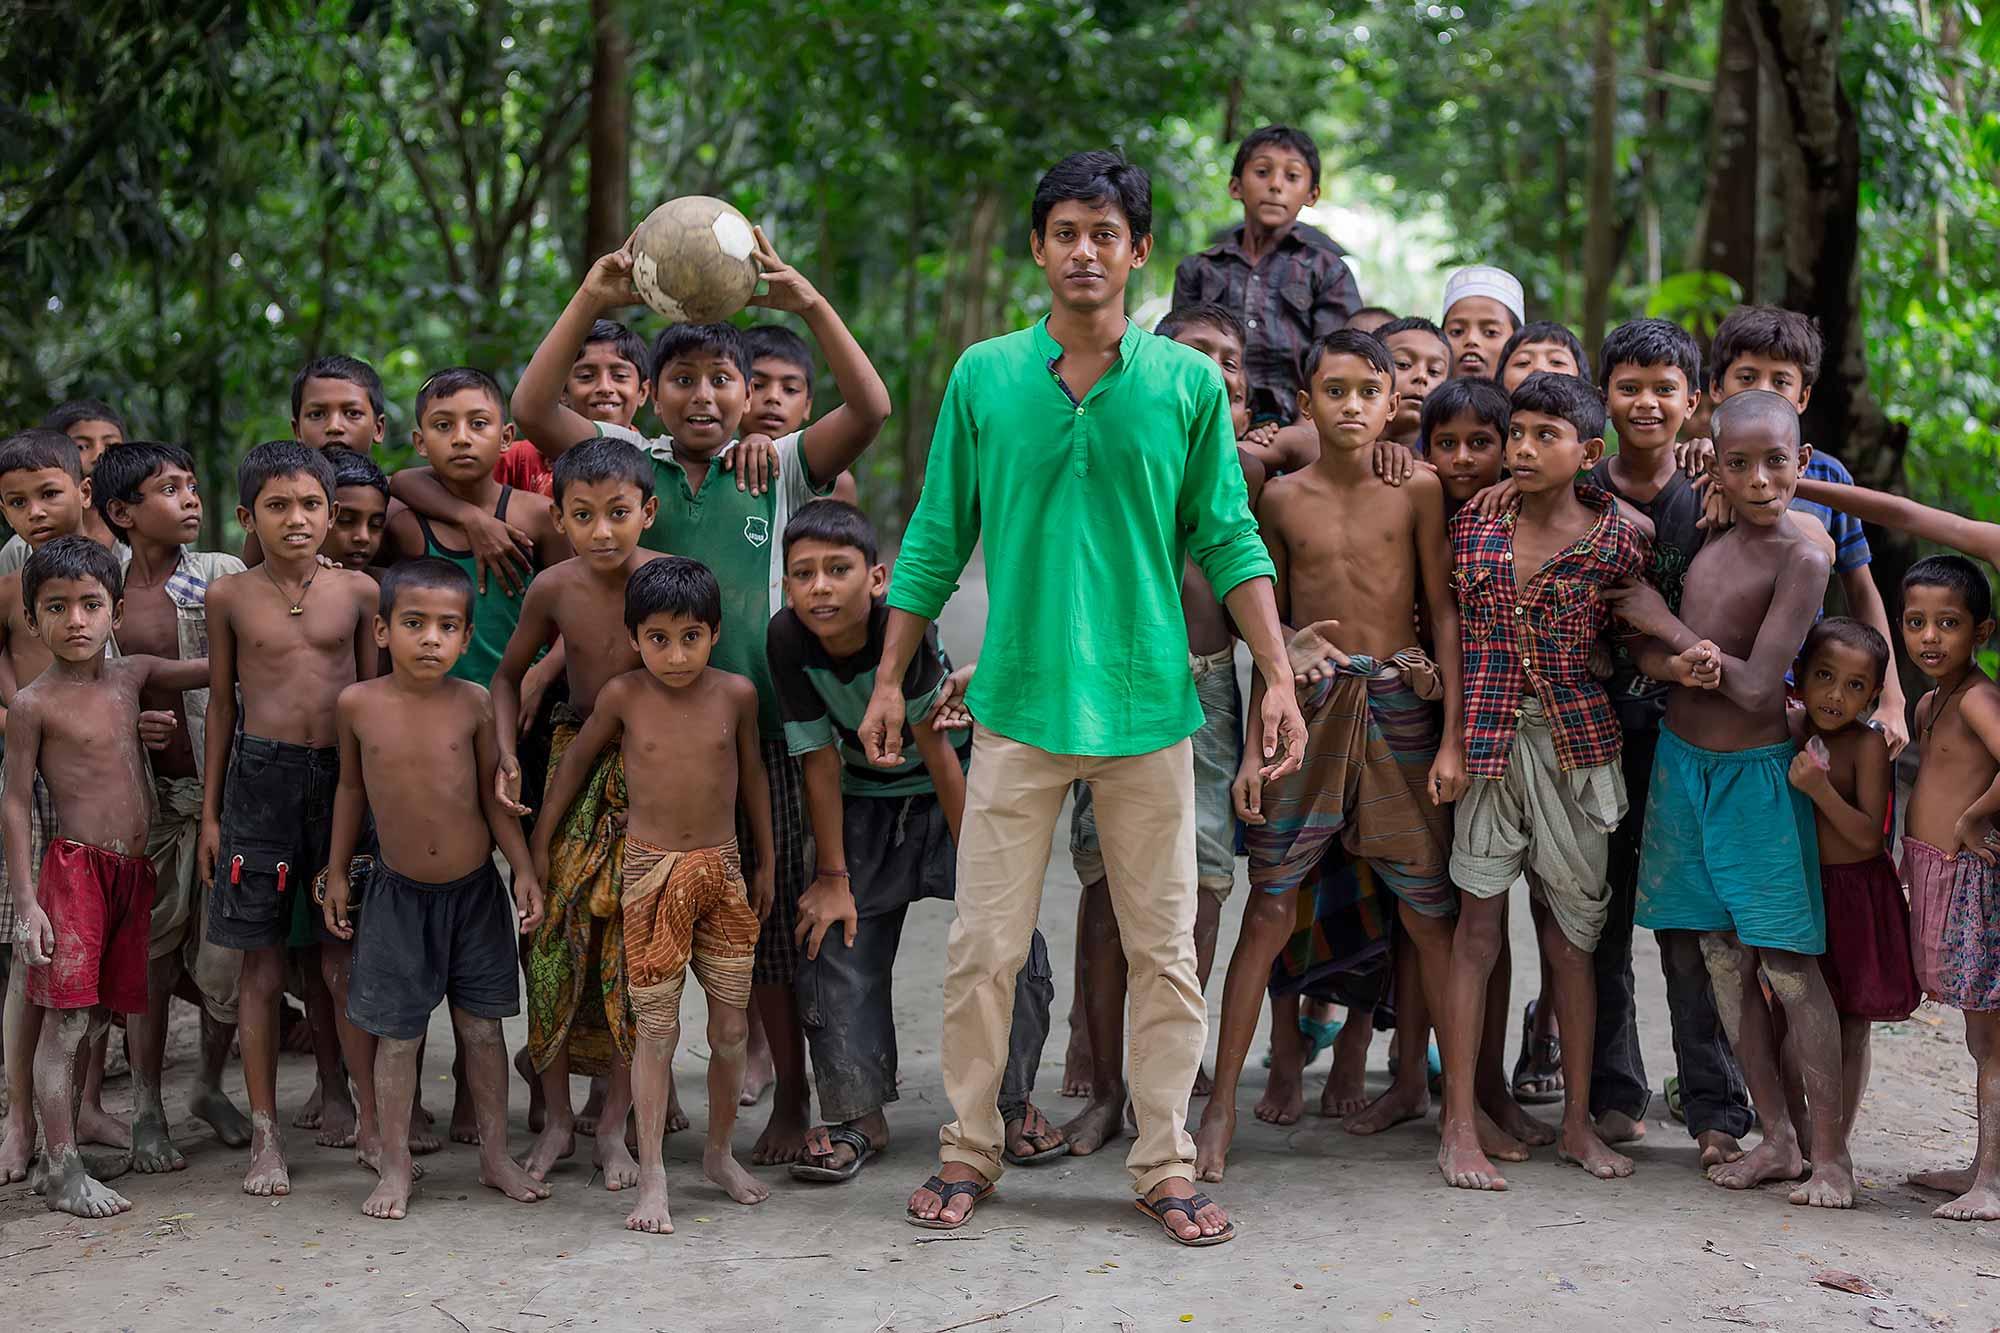 Children ready to play some football in Galachipa, Bangladesh. © Ulli Maier & Nisa Maier